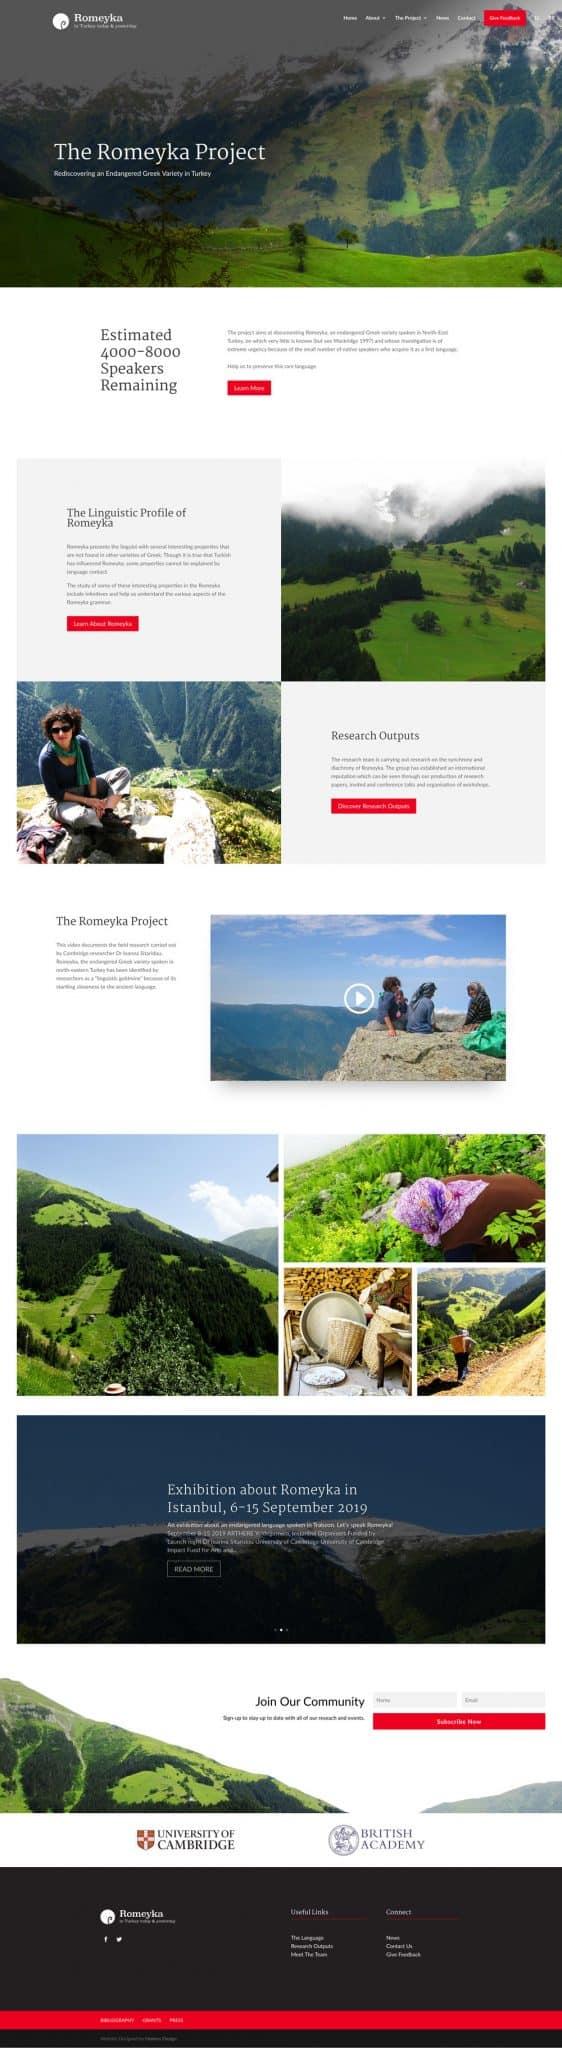 romeyka home page website design cambridge university